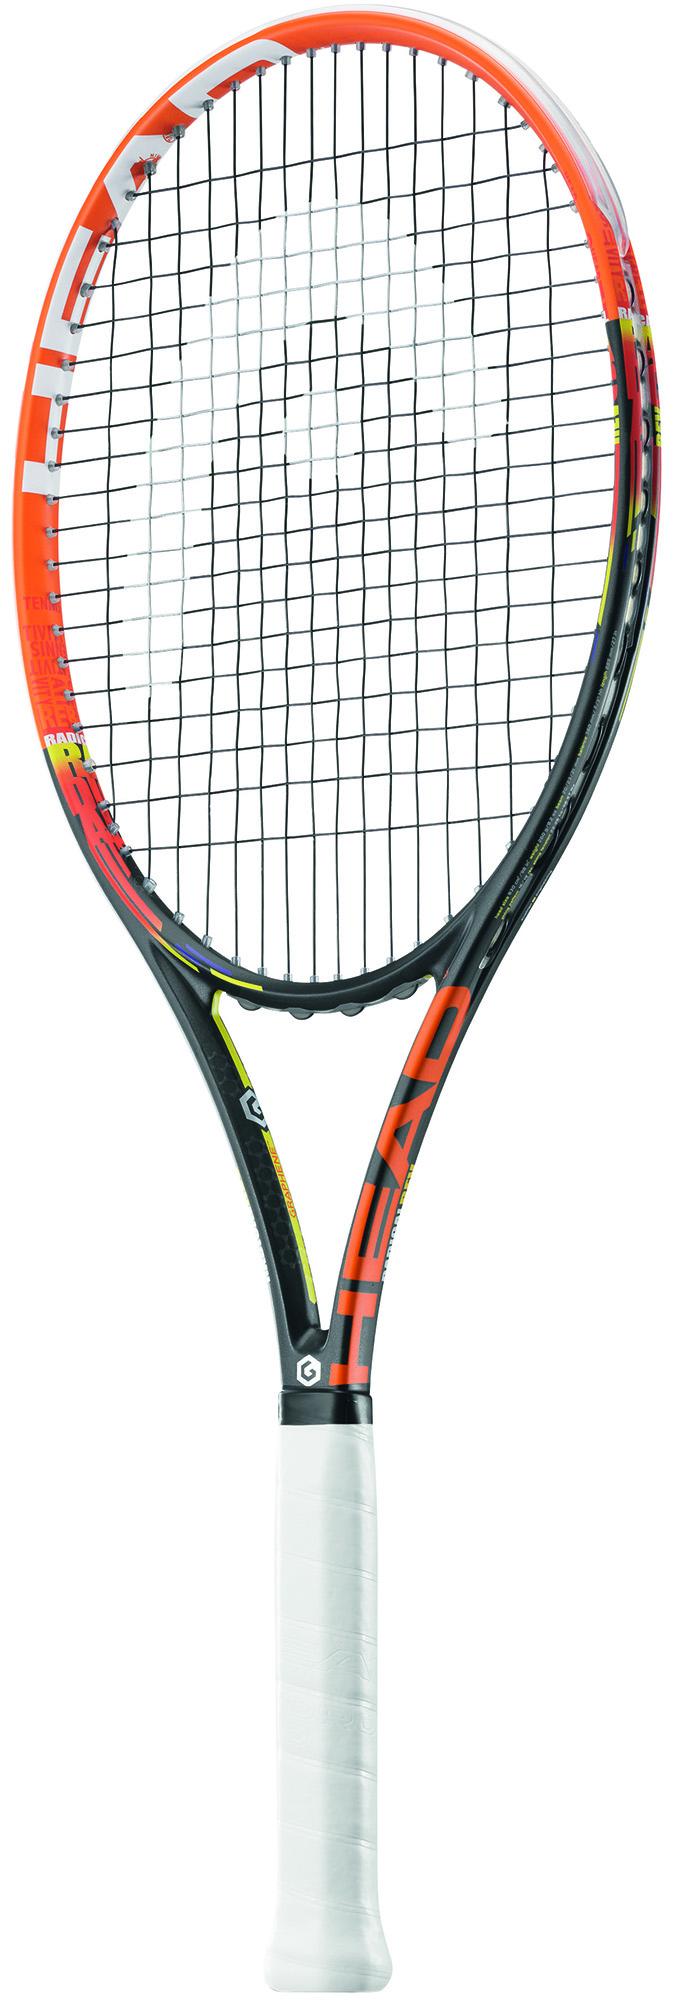 Head Ракетка для большого тенниса YouTek Graphene Radical REV